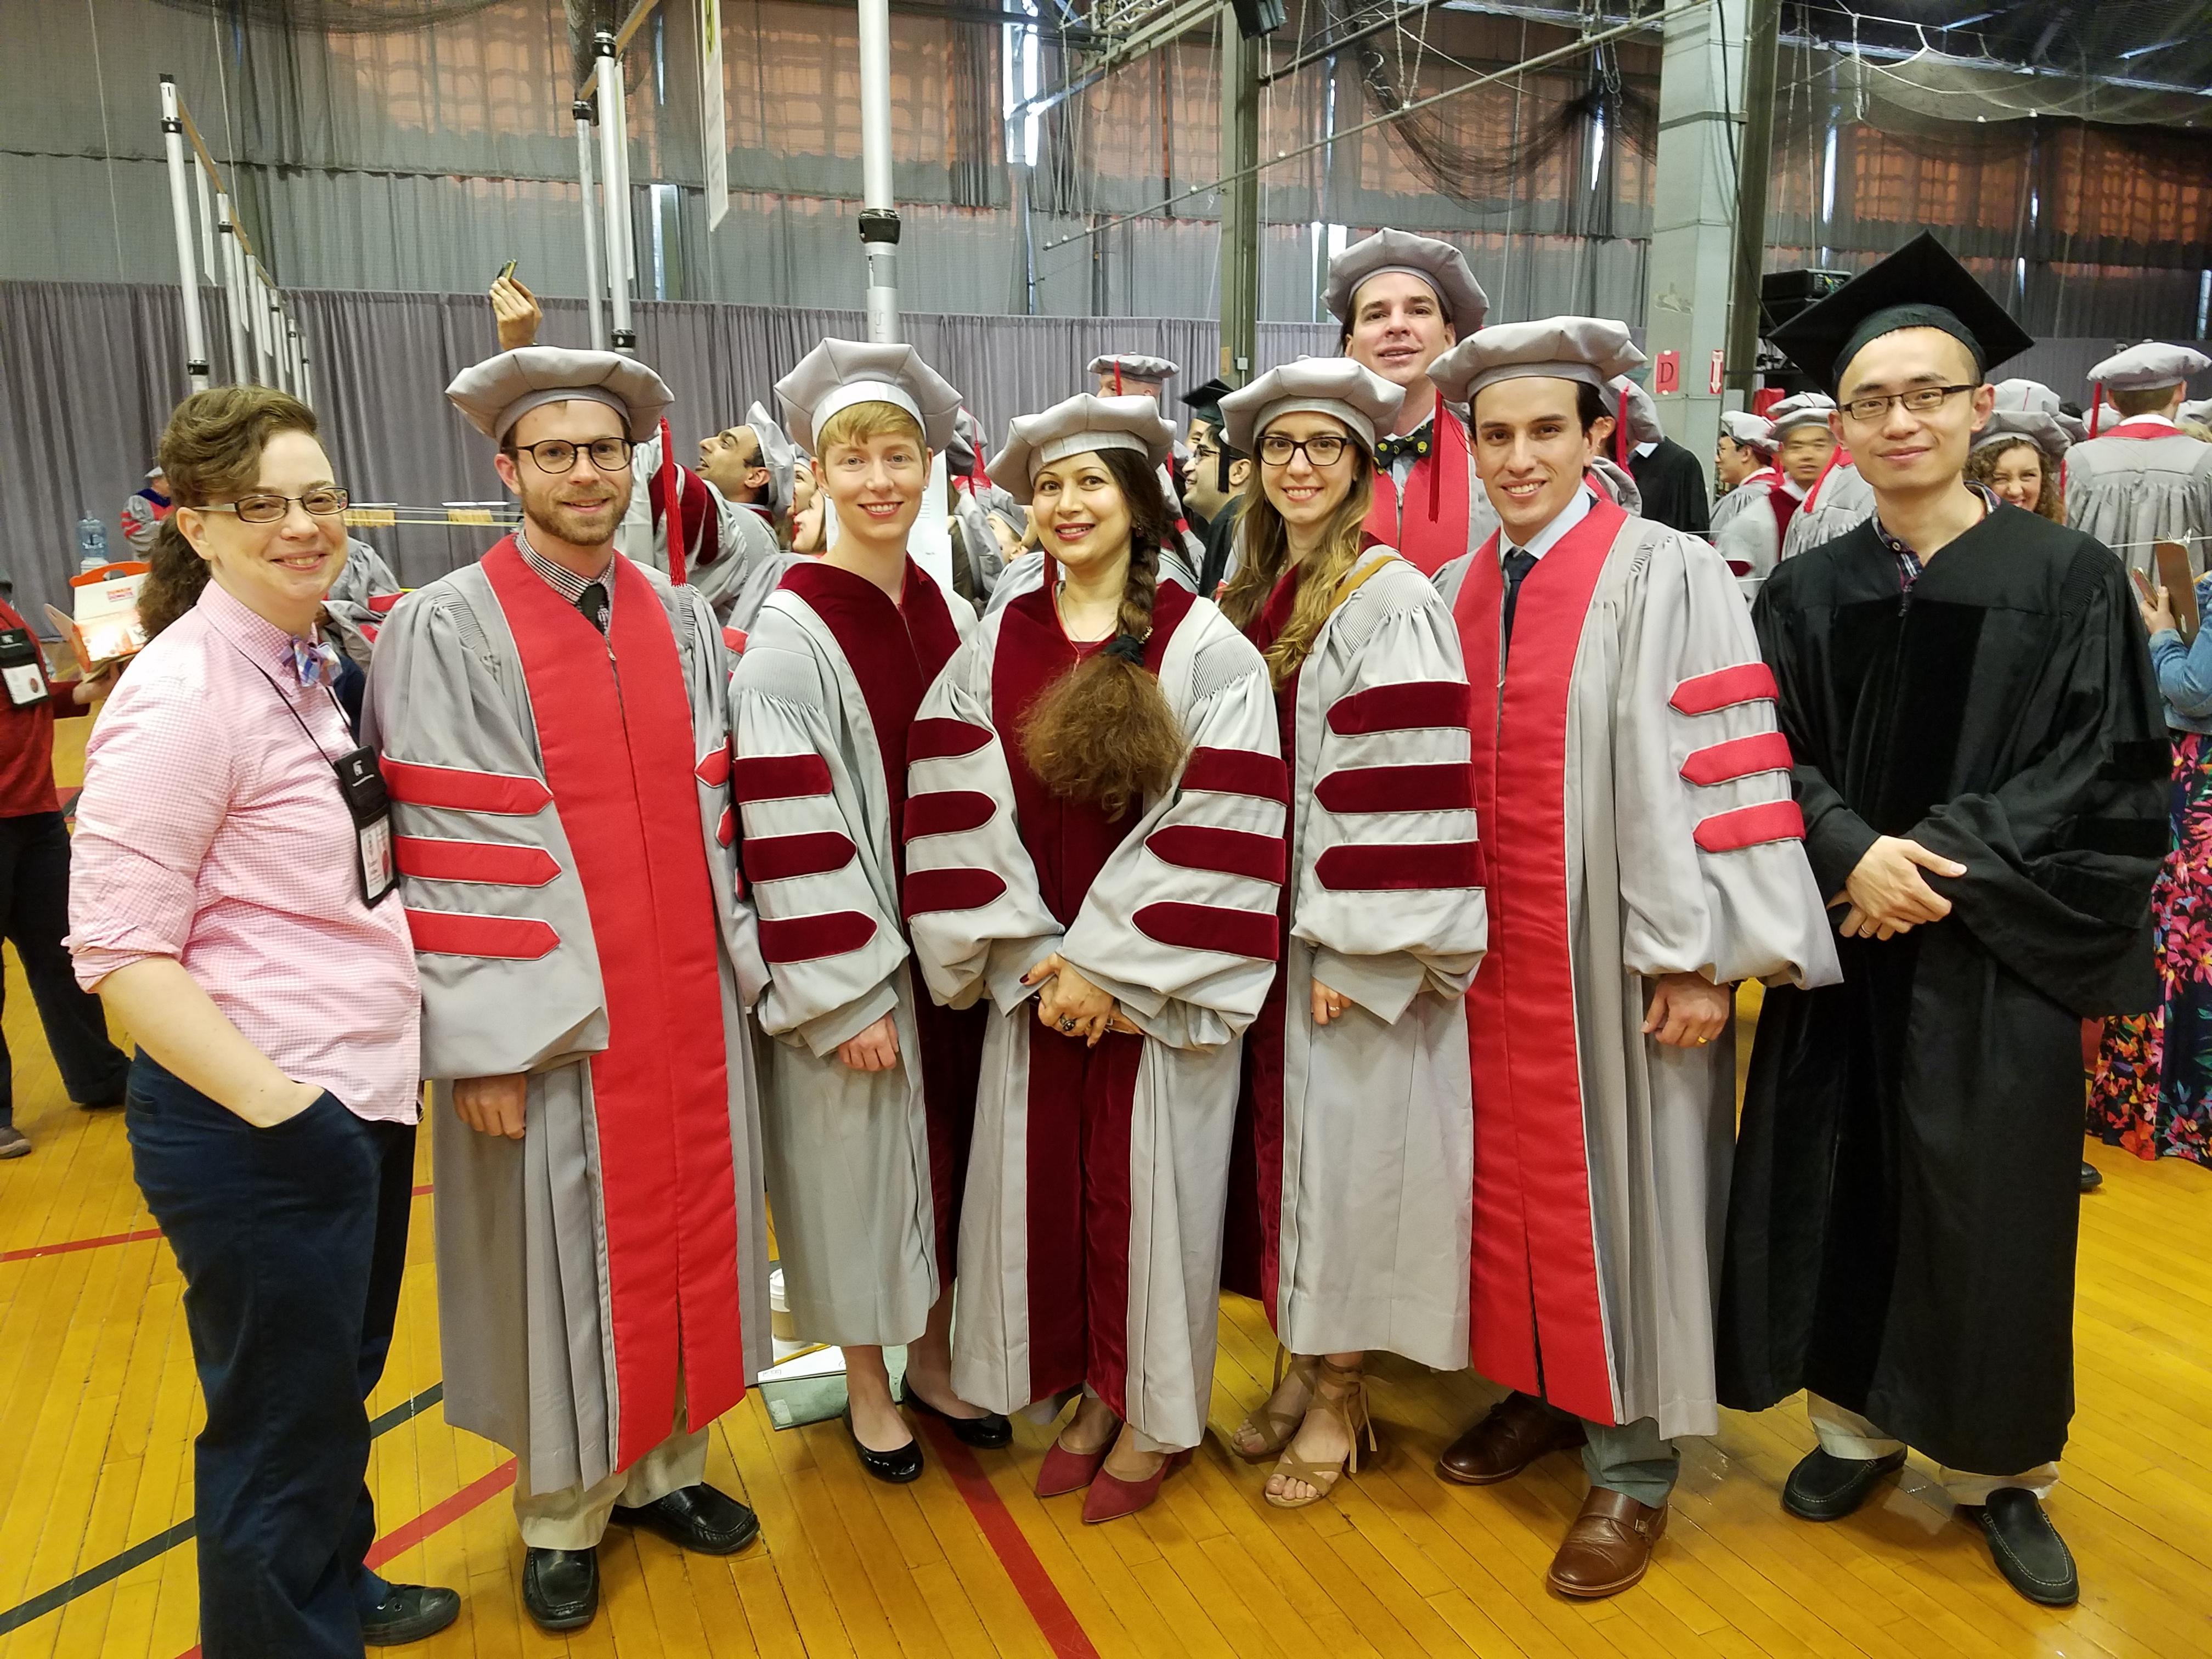 Academic Administrator Elizabeth Milnes, Dr. Michael Davidson, Dr. Sarah Fletcher, Dr. Sahar Hashmi, Dr. Goksin Kavlak, Dr. Joshua Mueller, Dr. Daniel Merchan, Dr. Jingshu Zhang